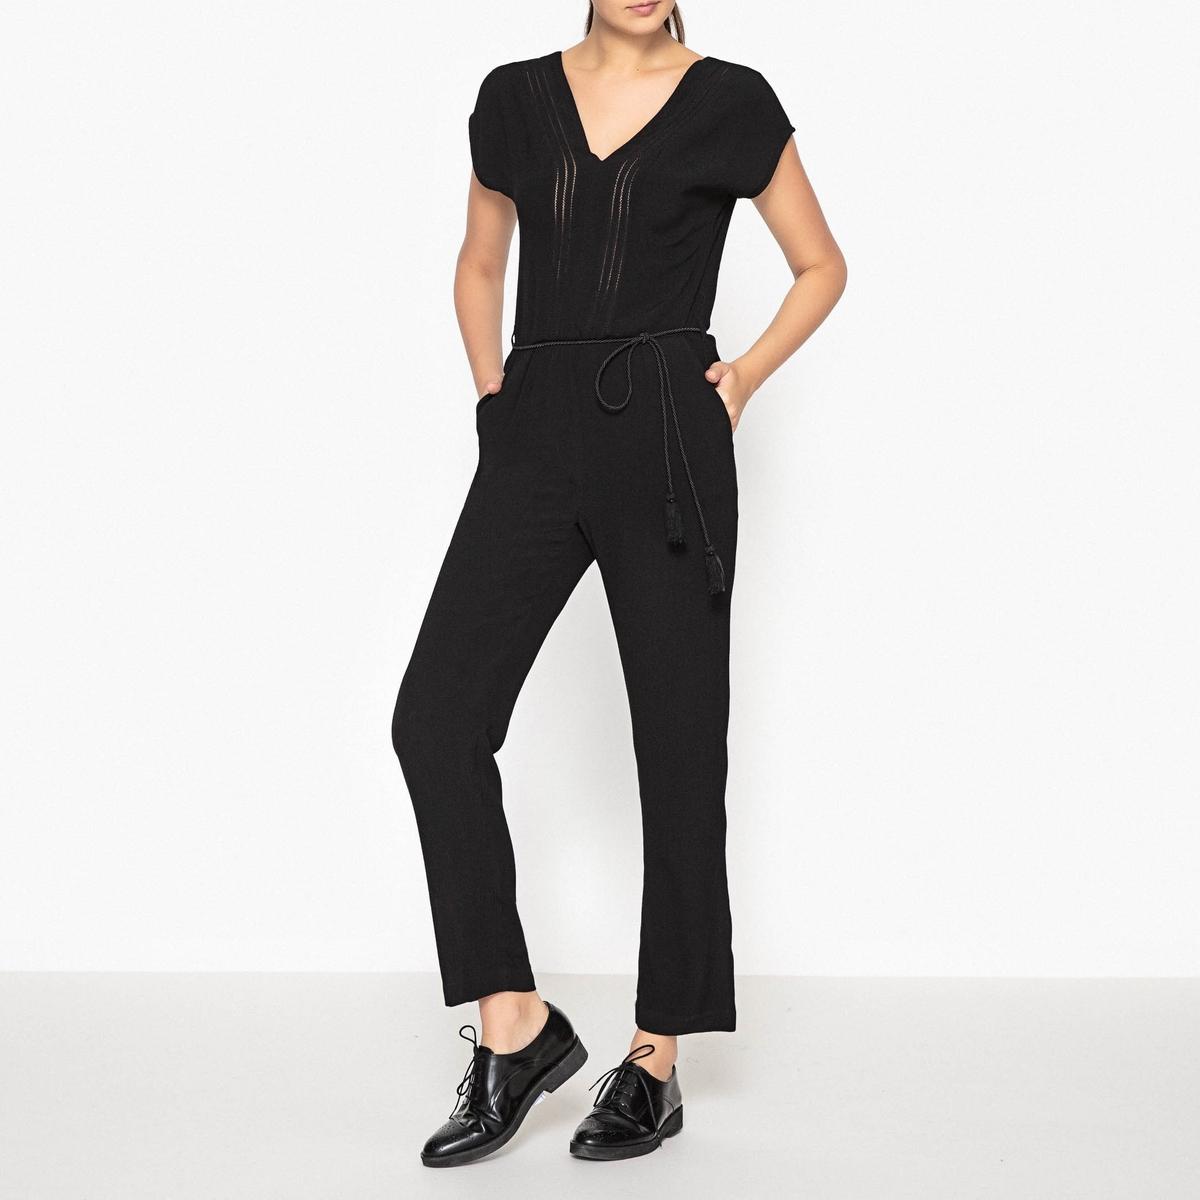 Комбинезон с брюками BEL DI sessun свитер с короткими рукавами